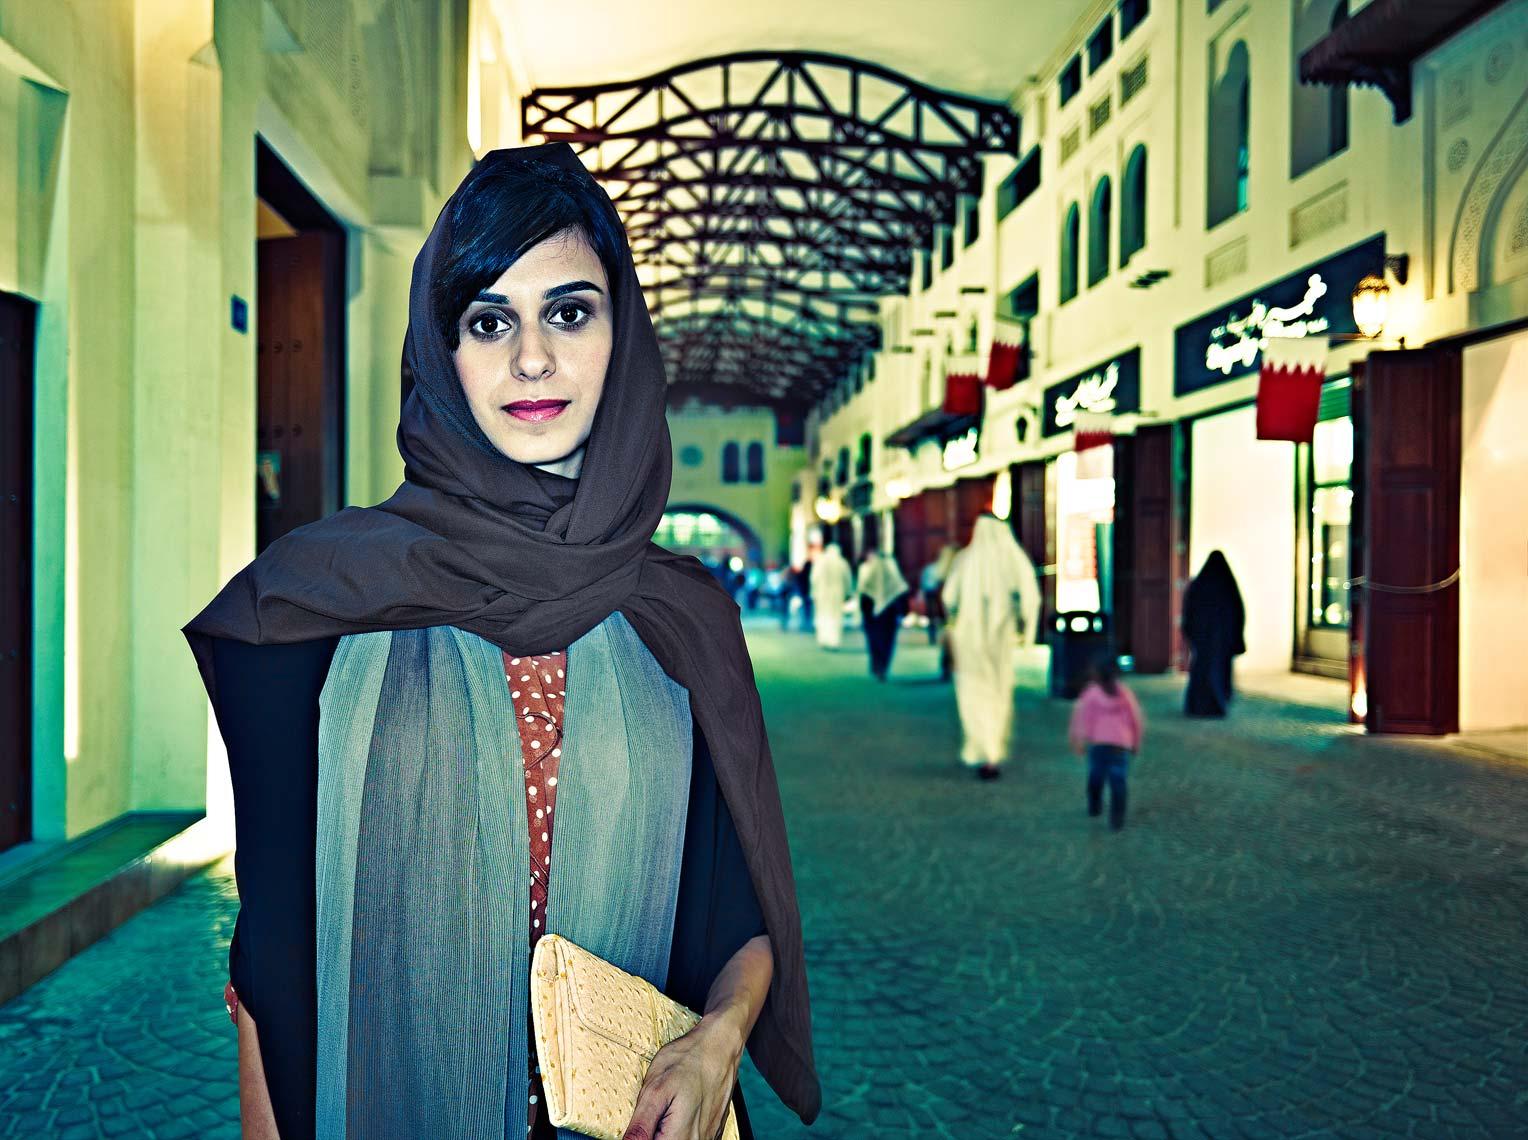 Woman_Street_Portrait1F.jpg